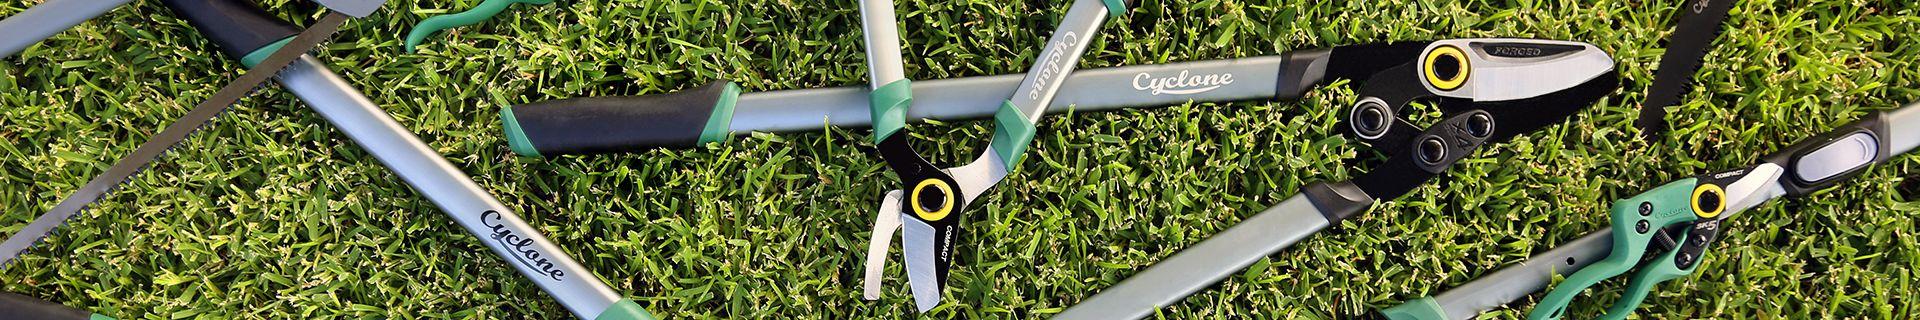 Garden hand tools lying on grass.